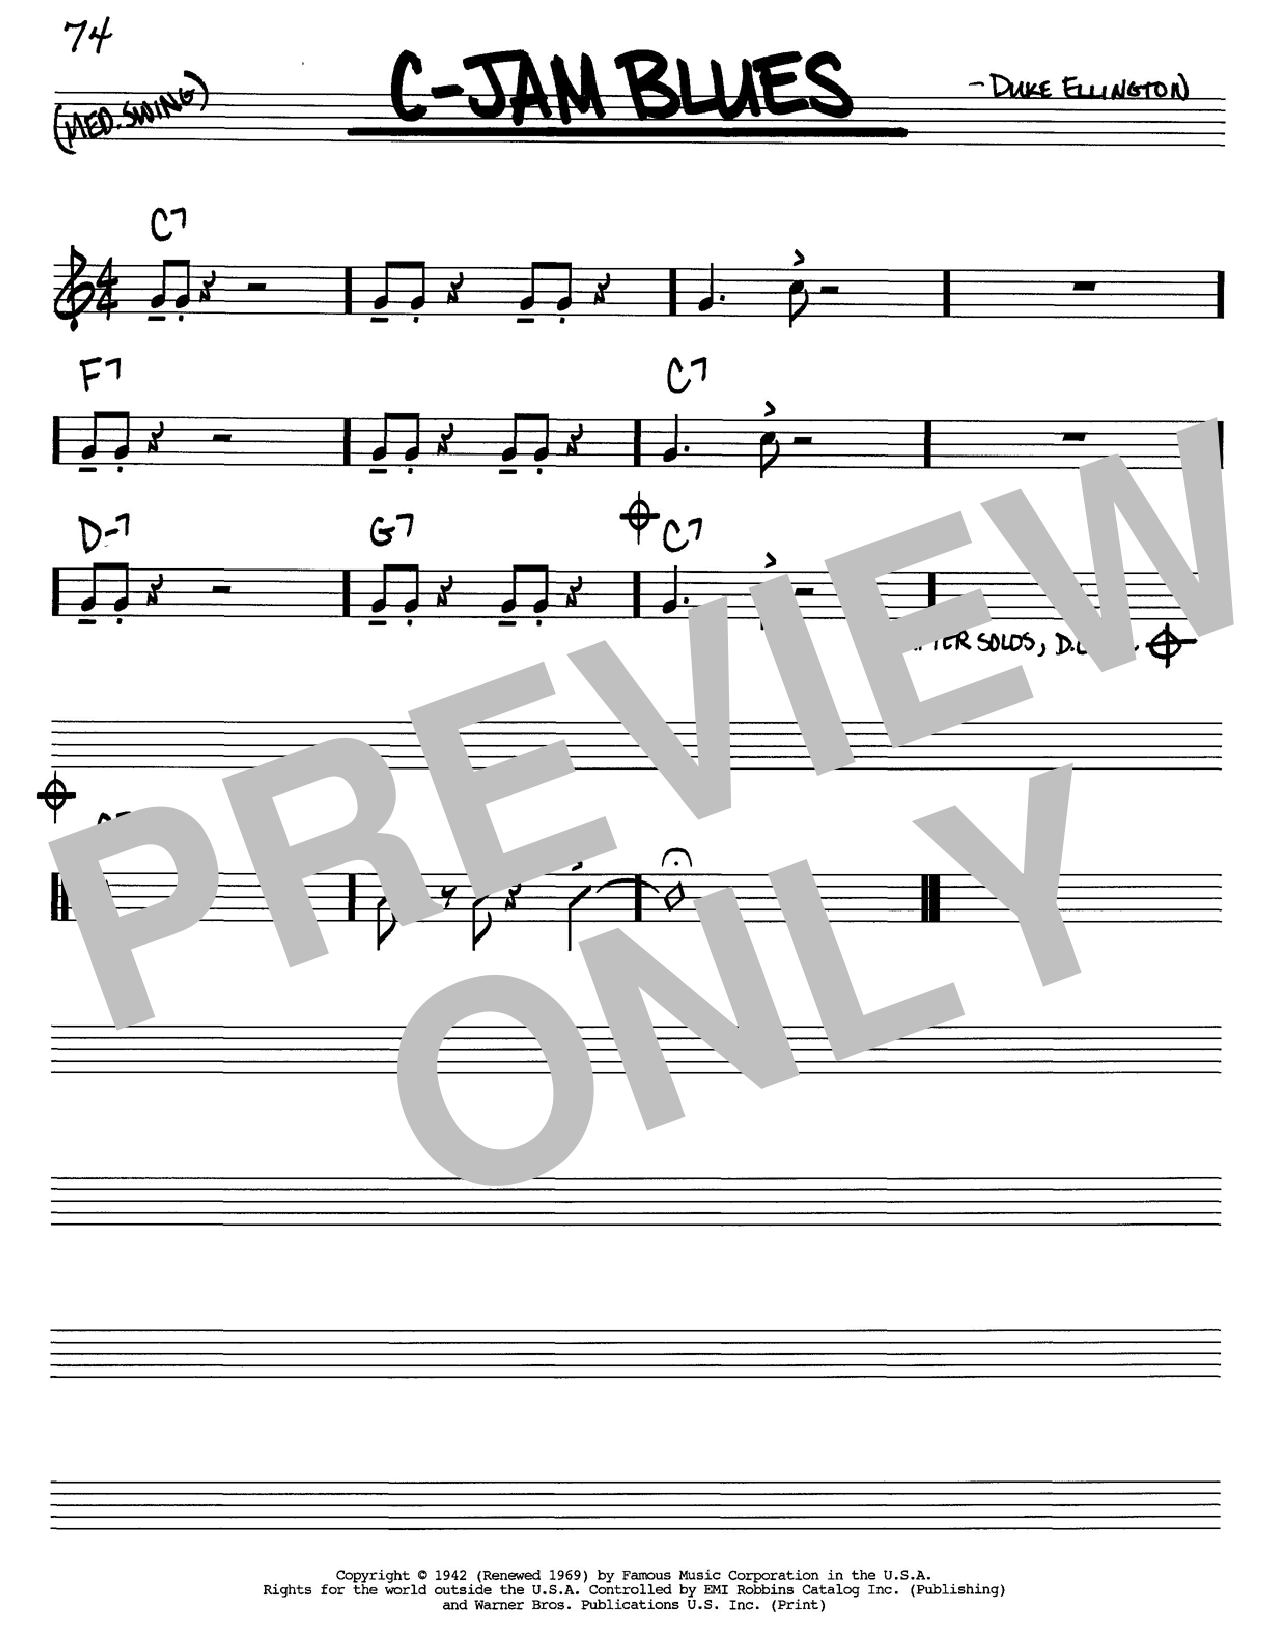 C-Jam Blues sheet music